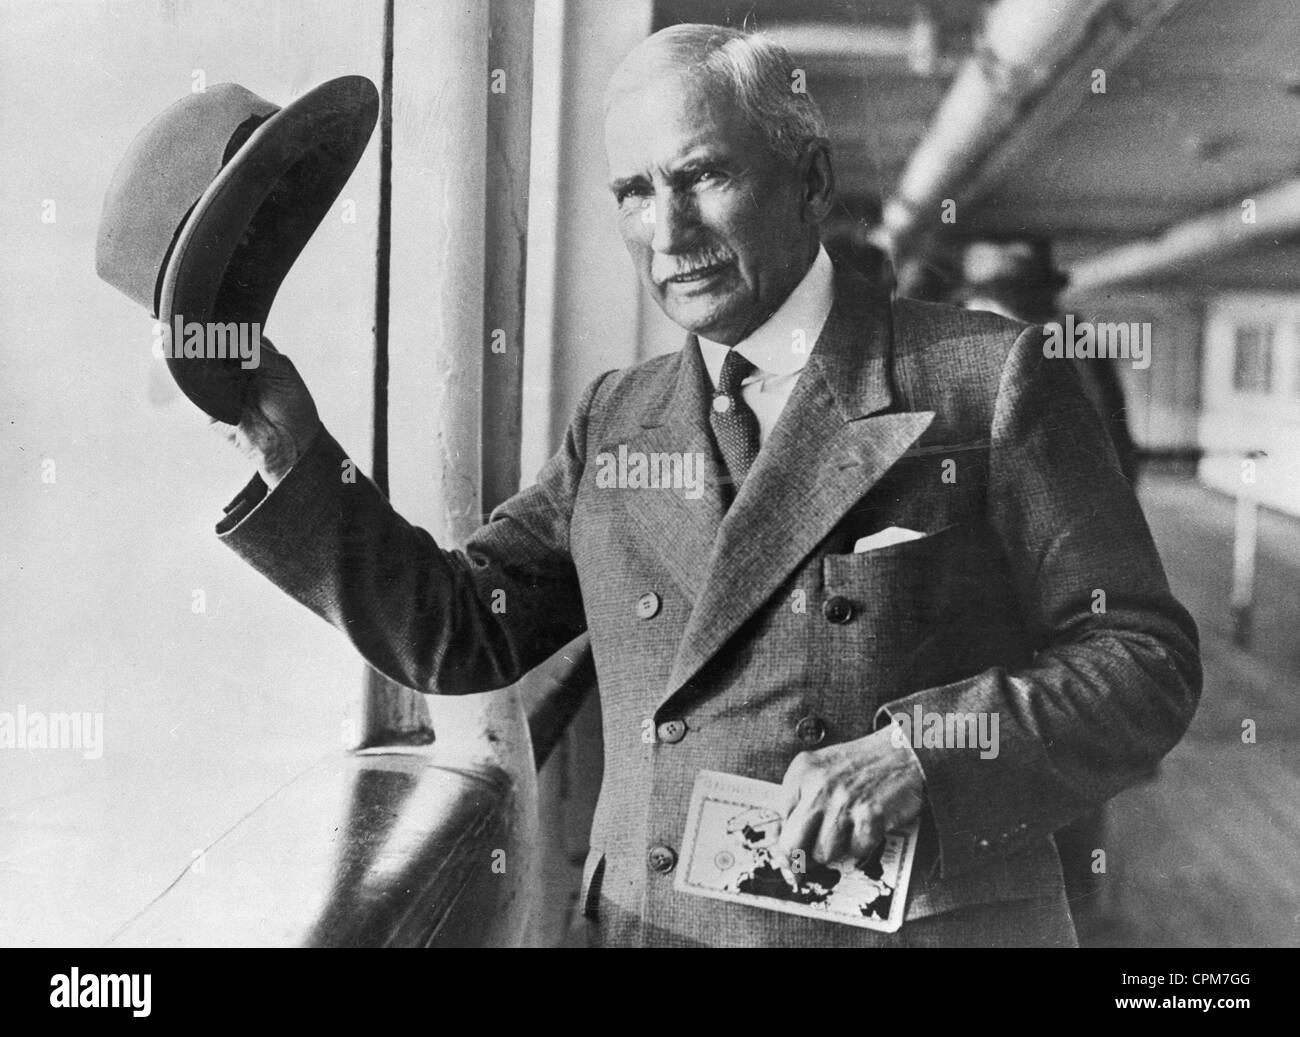 James Barry Munnick Hertzog, 1937 - Stock Image